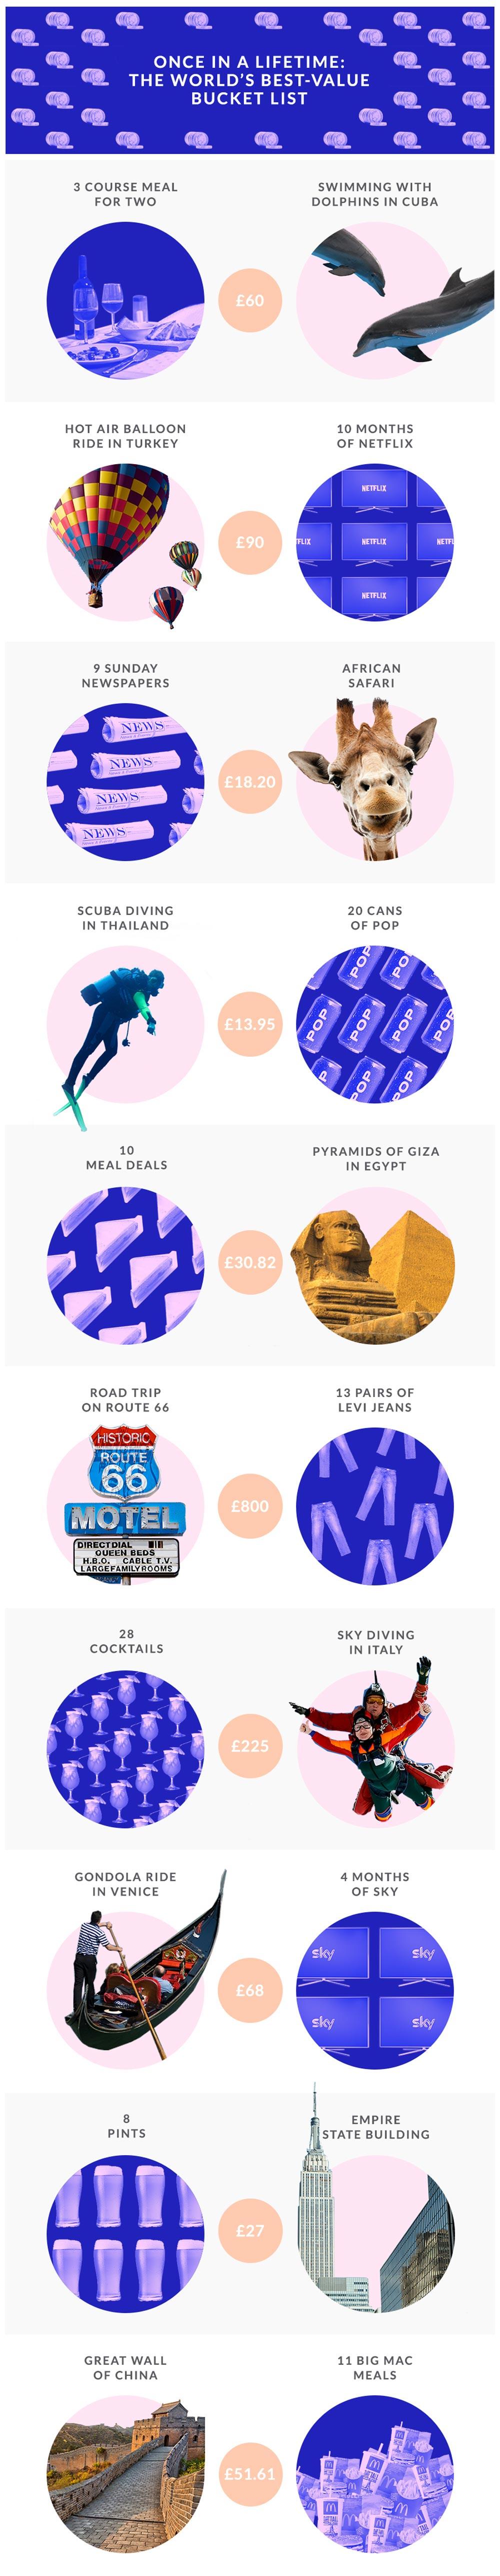 ICE-Bucket_list_Infographic